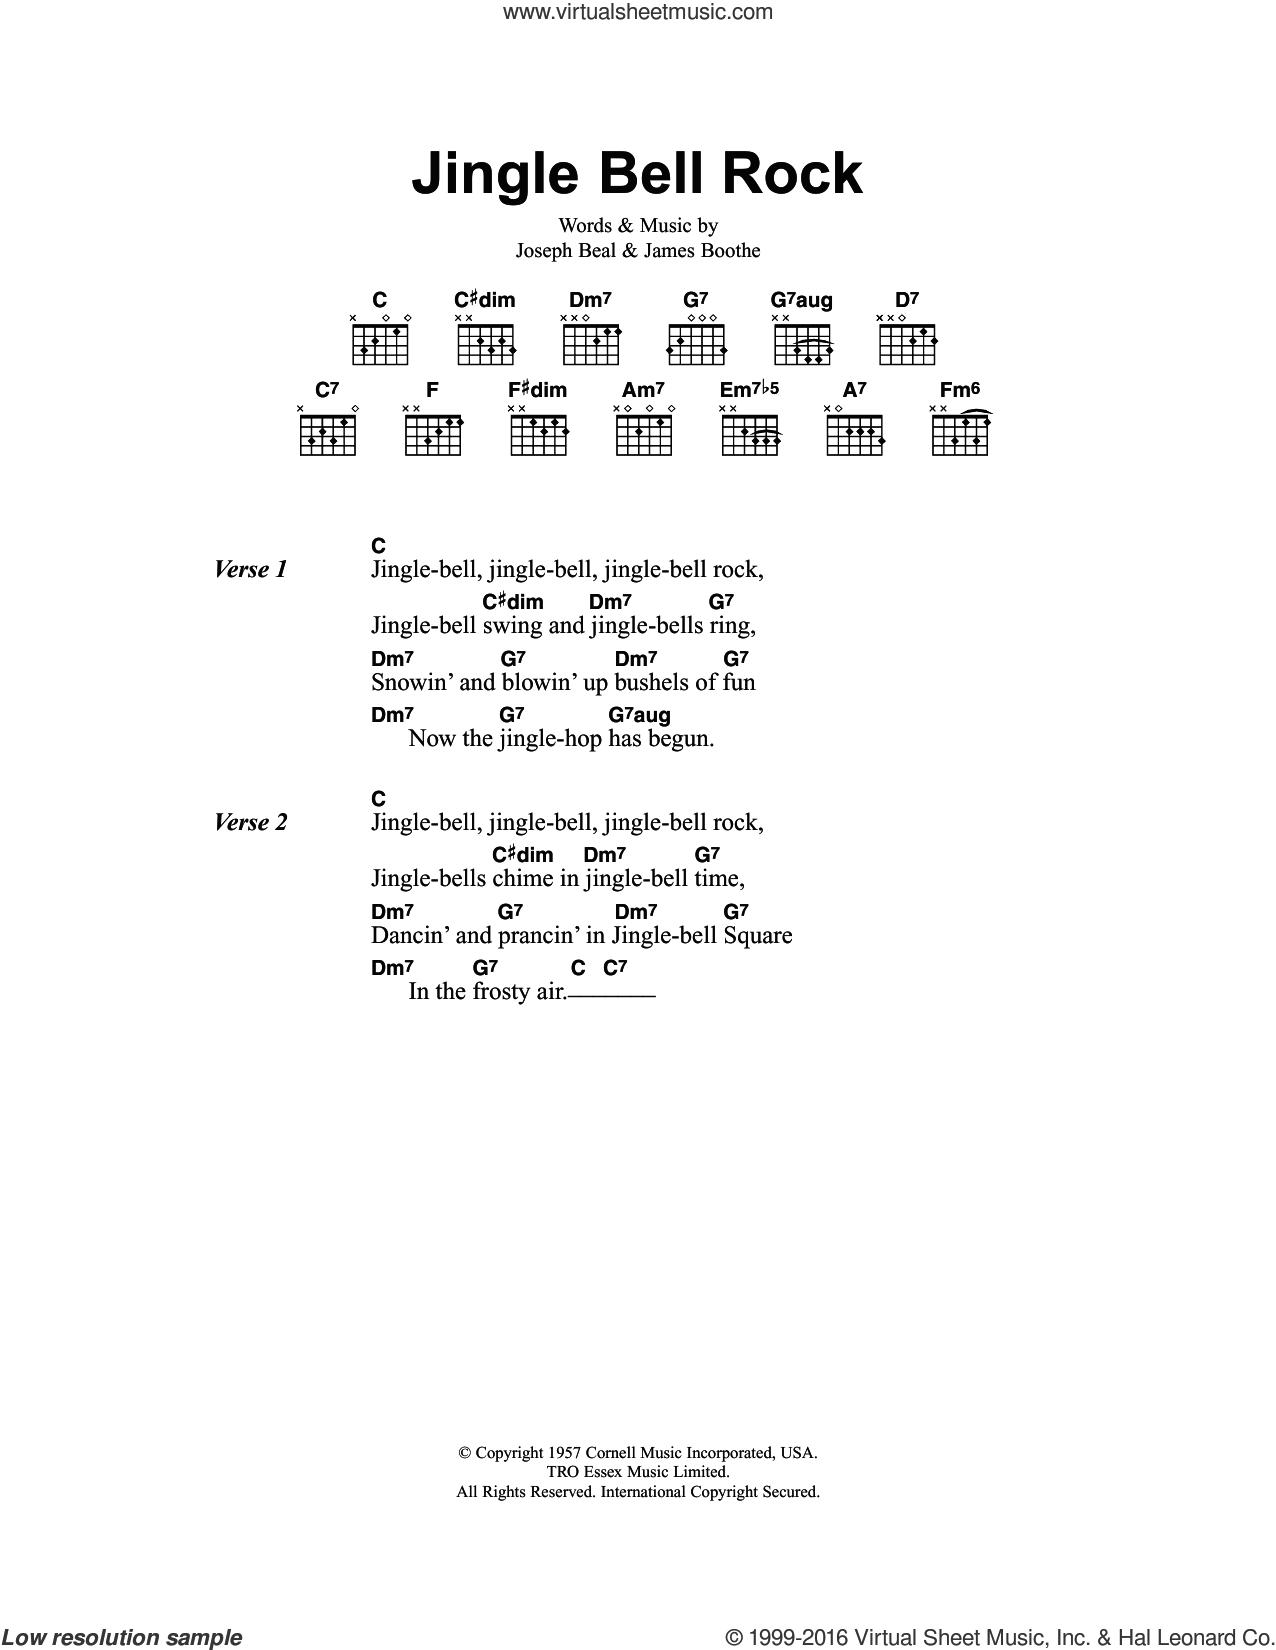 Checker - Jingle Bell Rock sheet music for guitar (chords) [PDF]